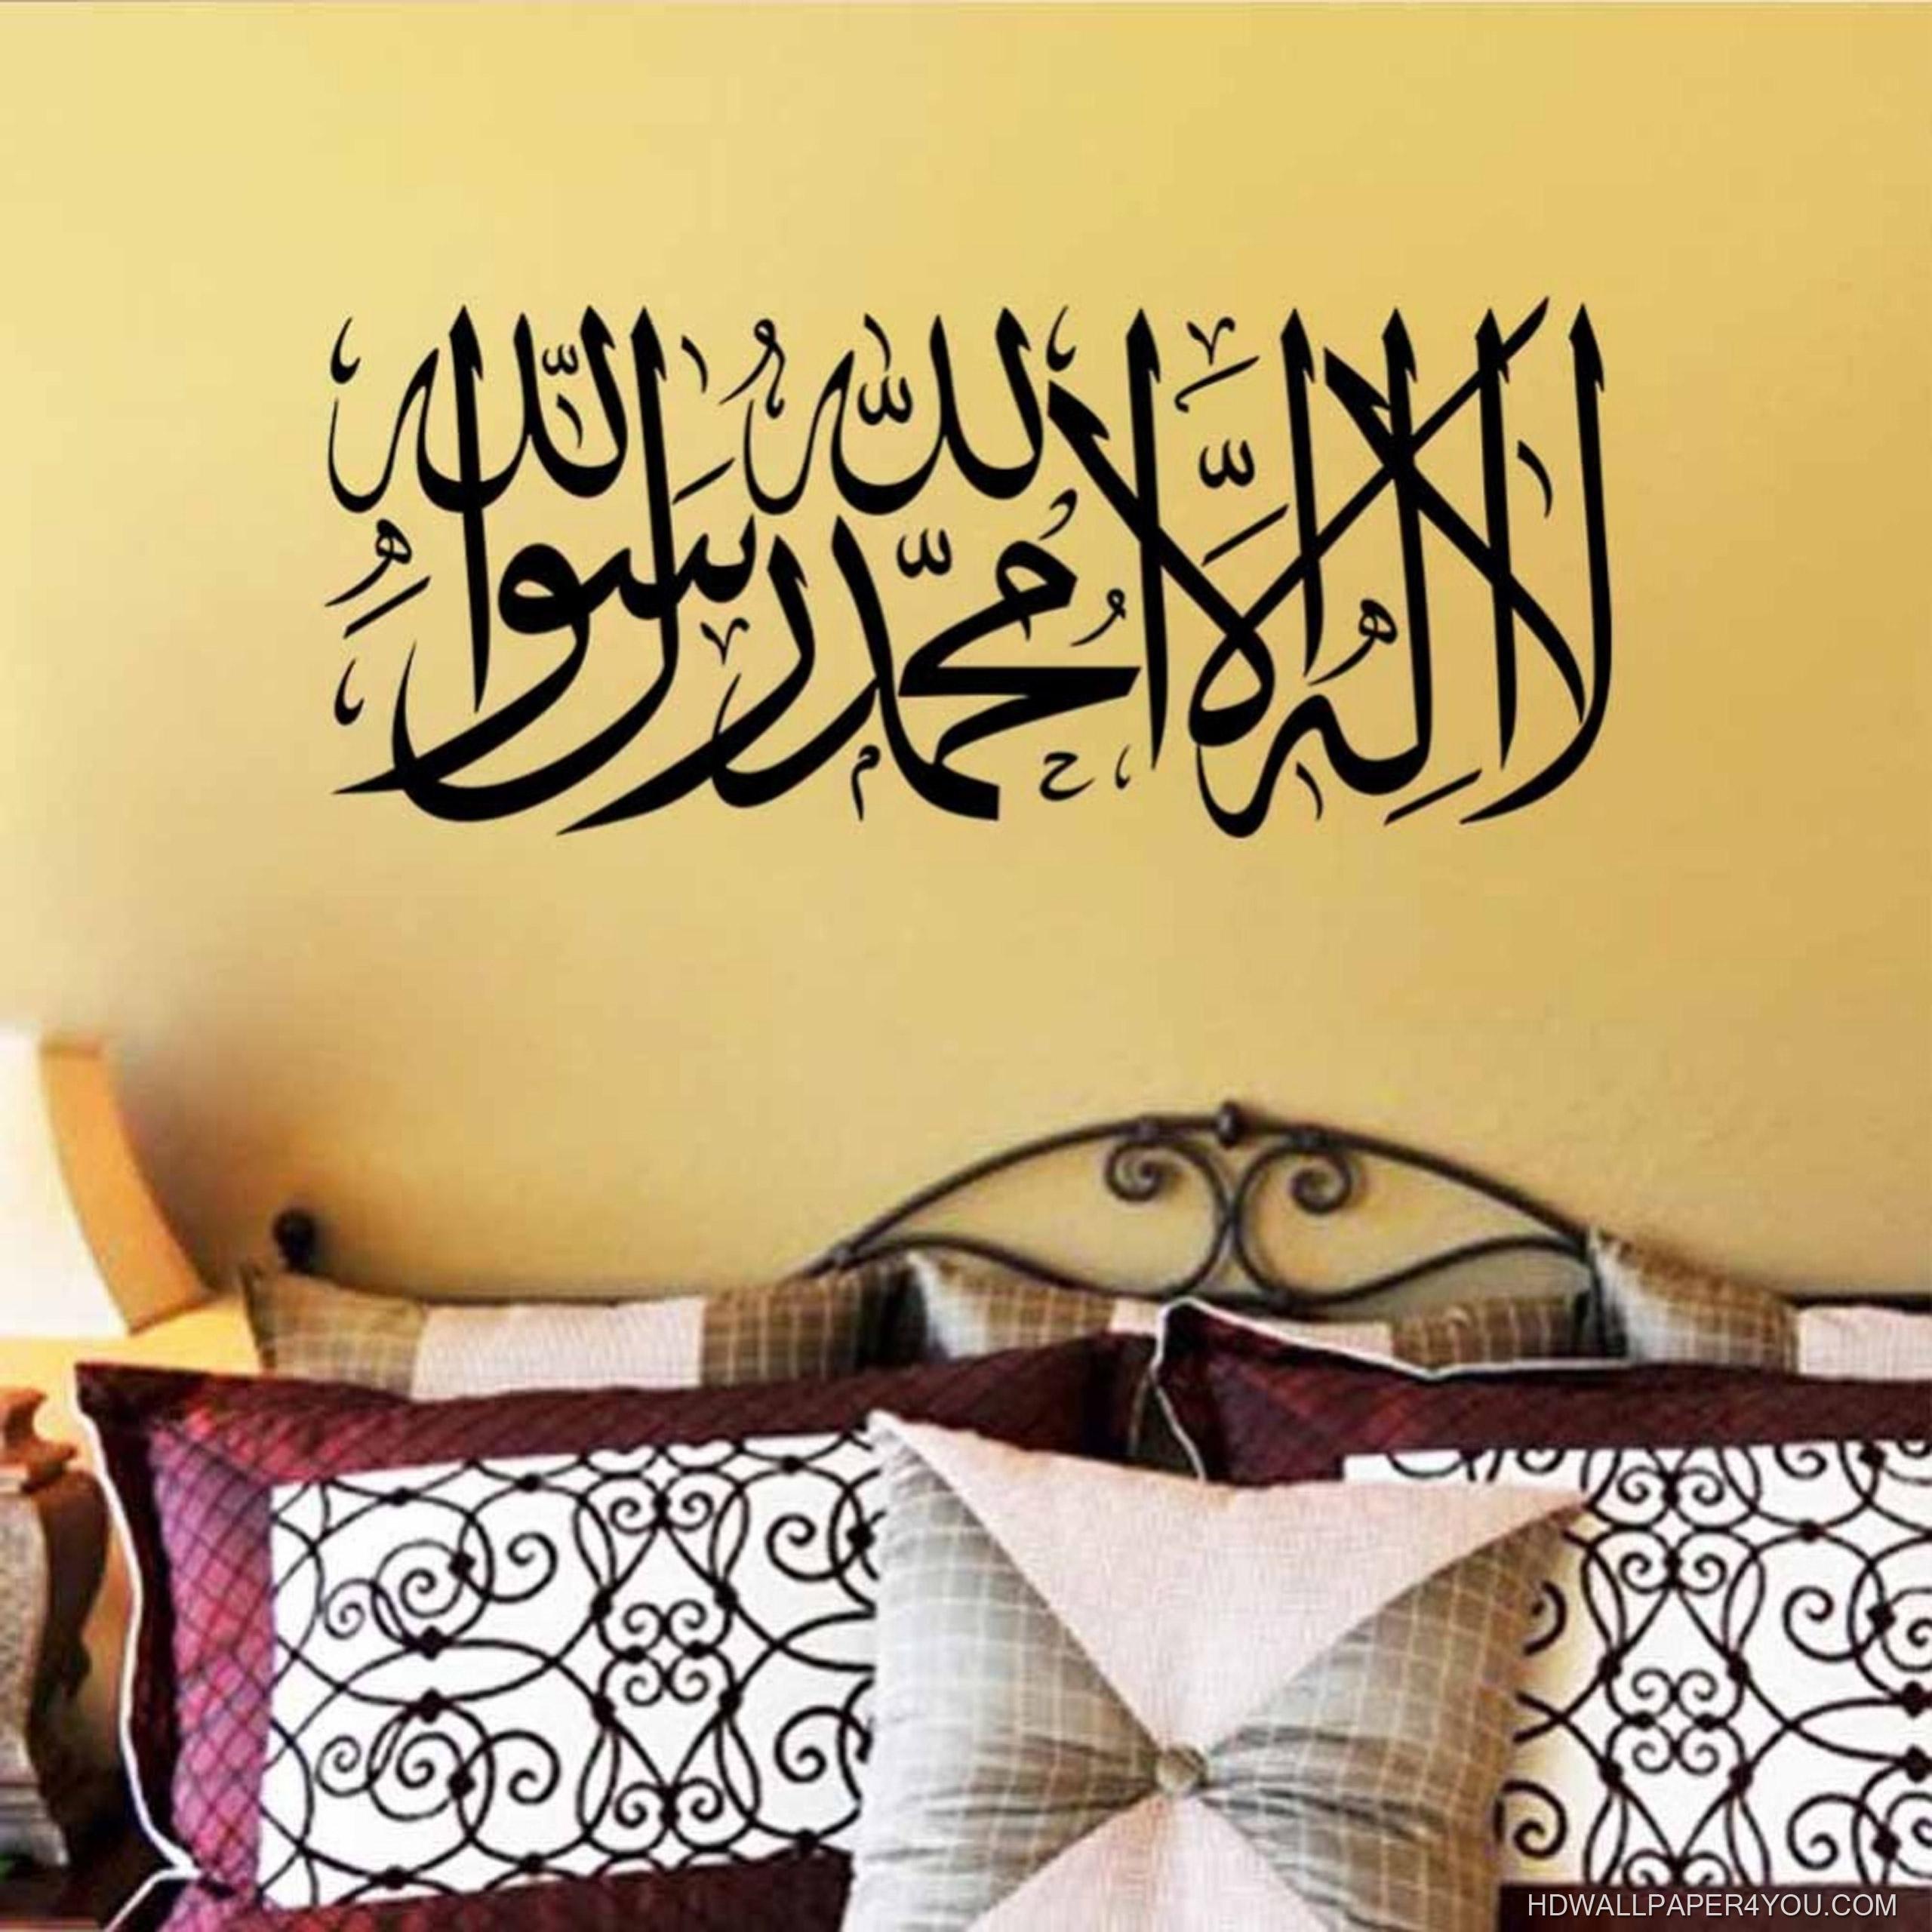 صور اجمل صور اسلاميه , صور دينيه جميله ومريحه للنفس